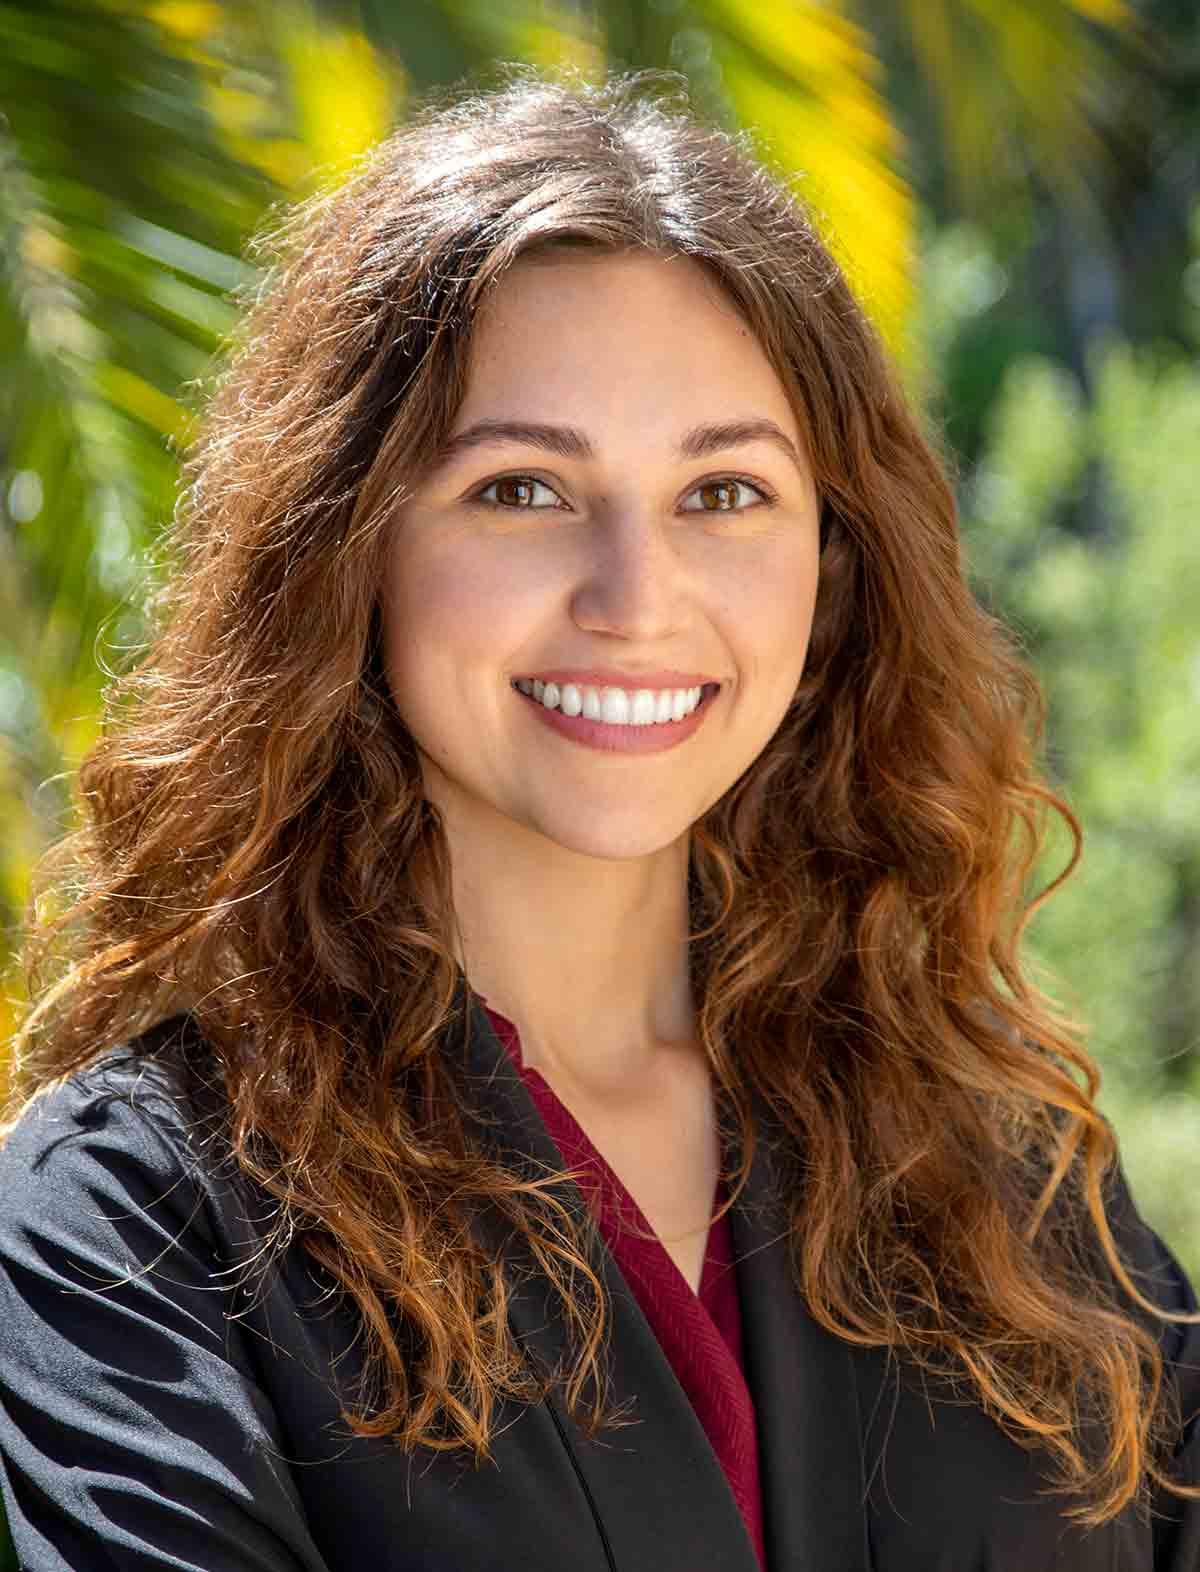 Susan-Polk-Insurance-San-Luis-Obispo-headshot-Kaitlin